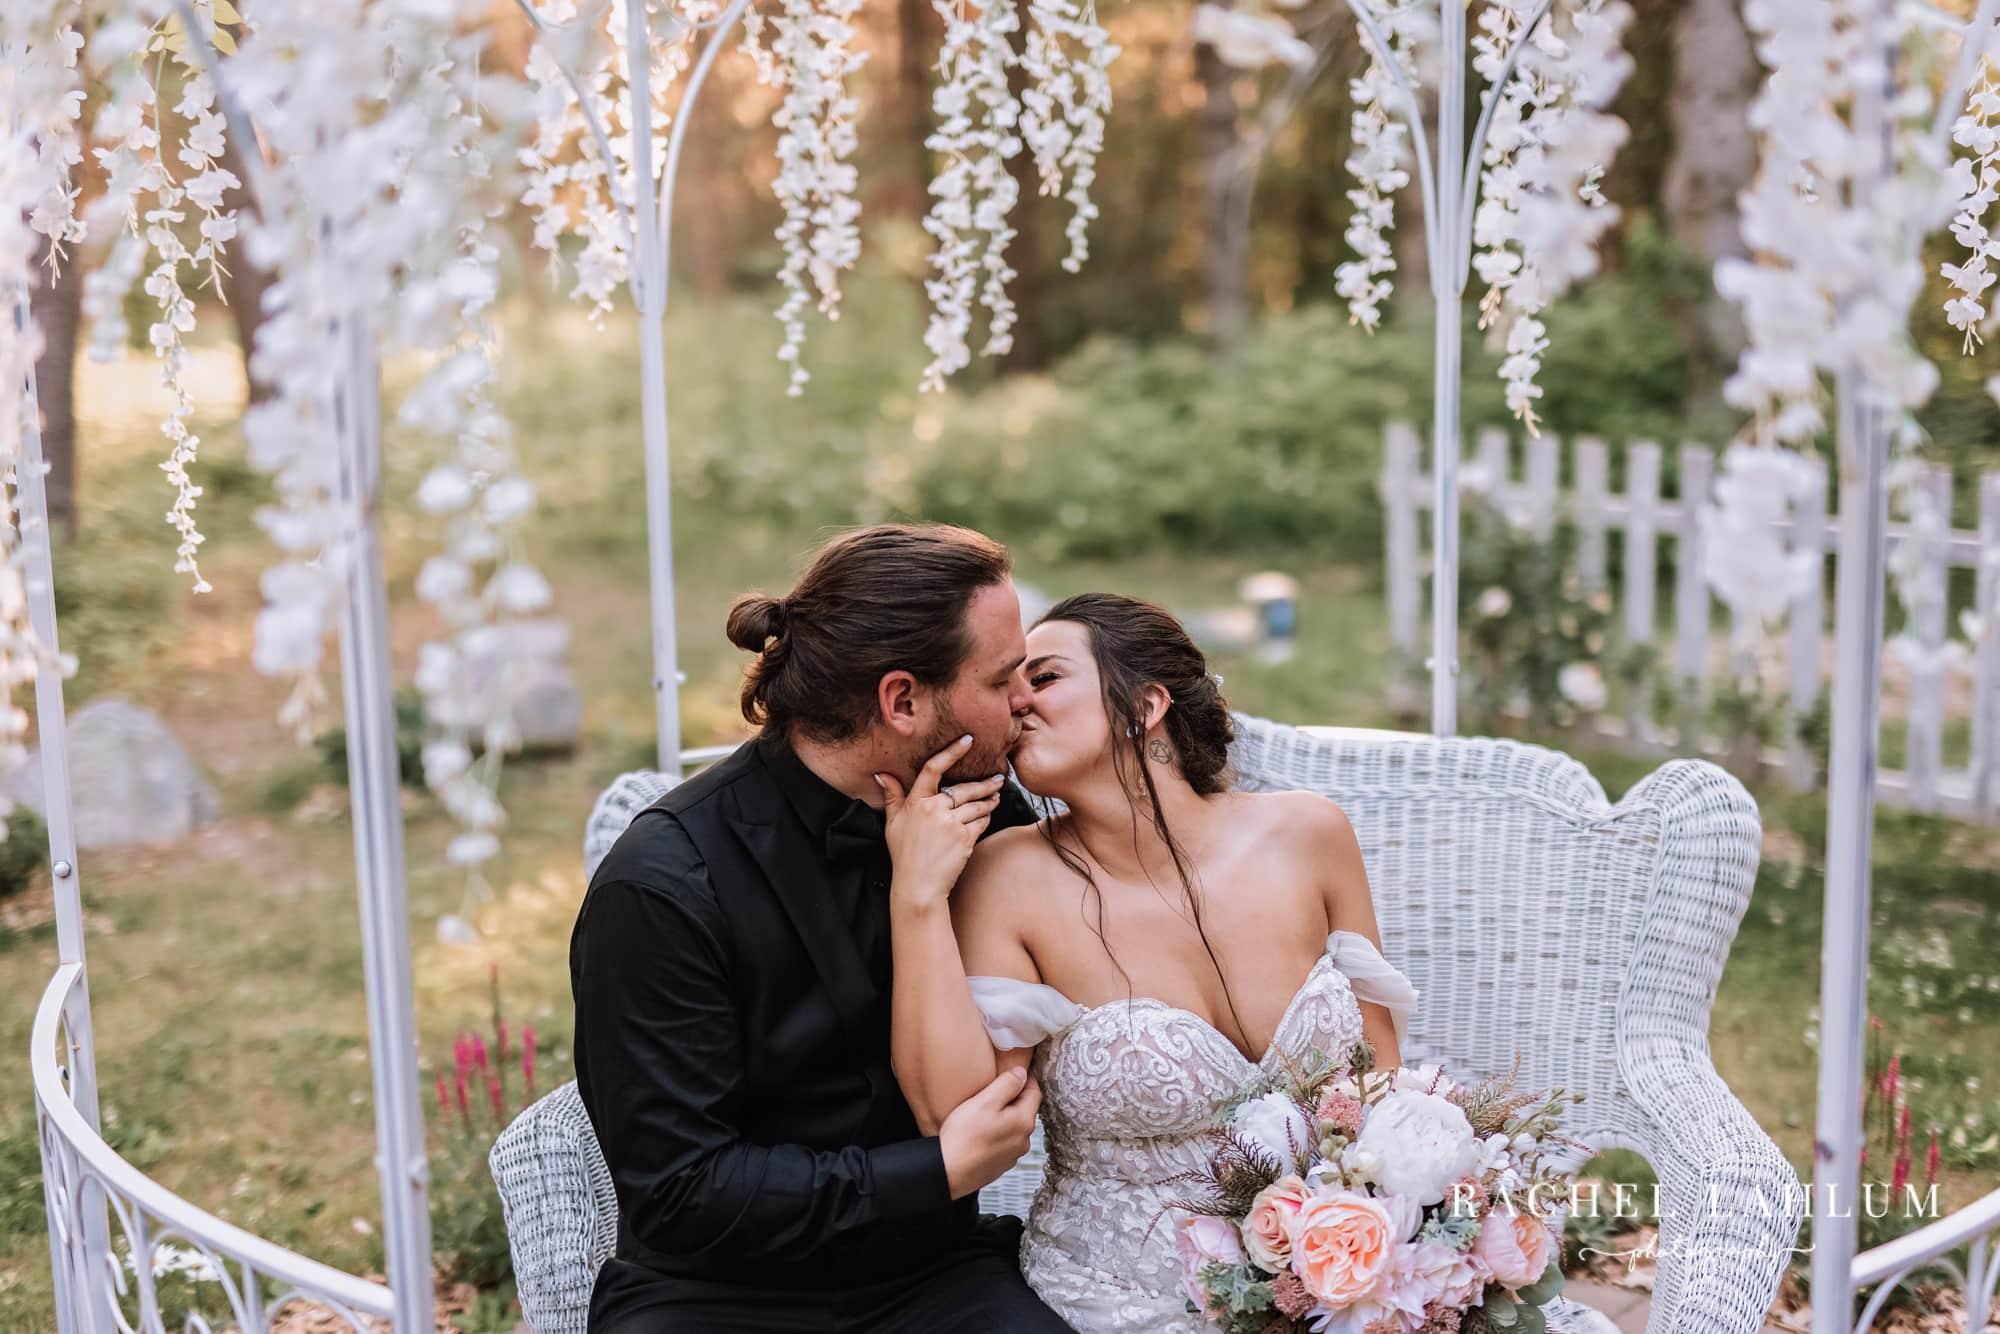 Bride and groom kiss at sunset after wedding at Wilderness Wedding Barn in Bigfork, Minnesota.